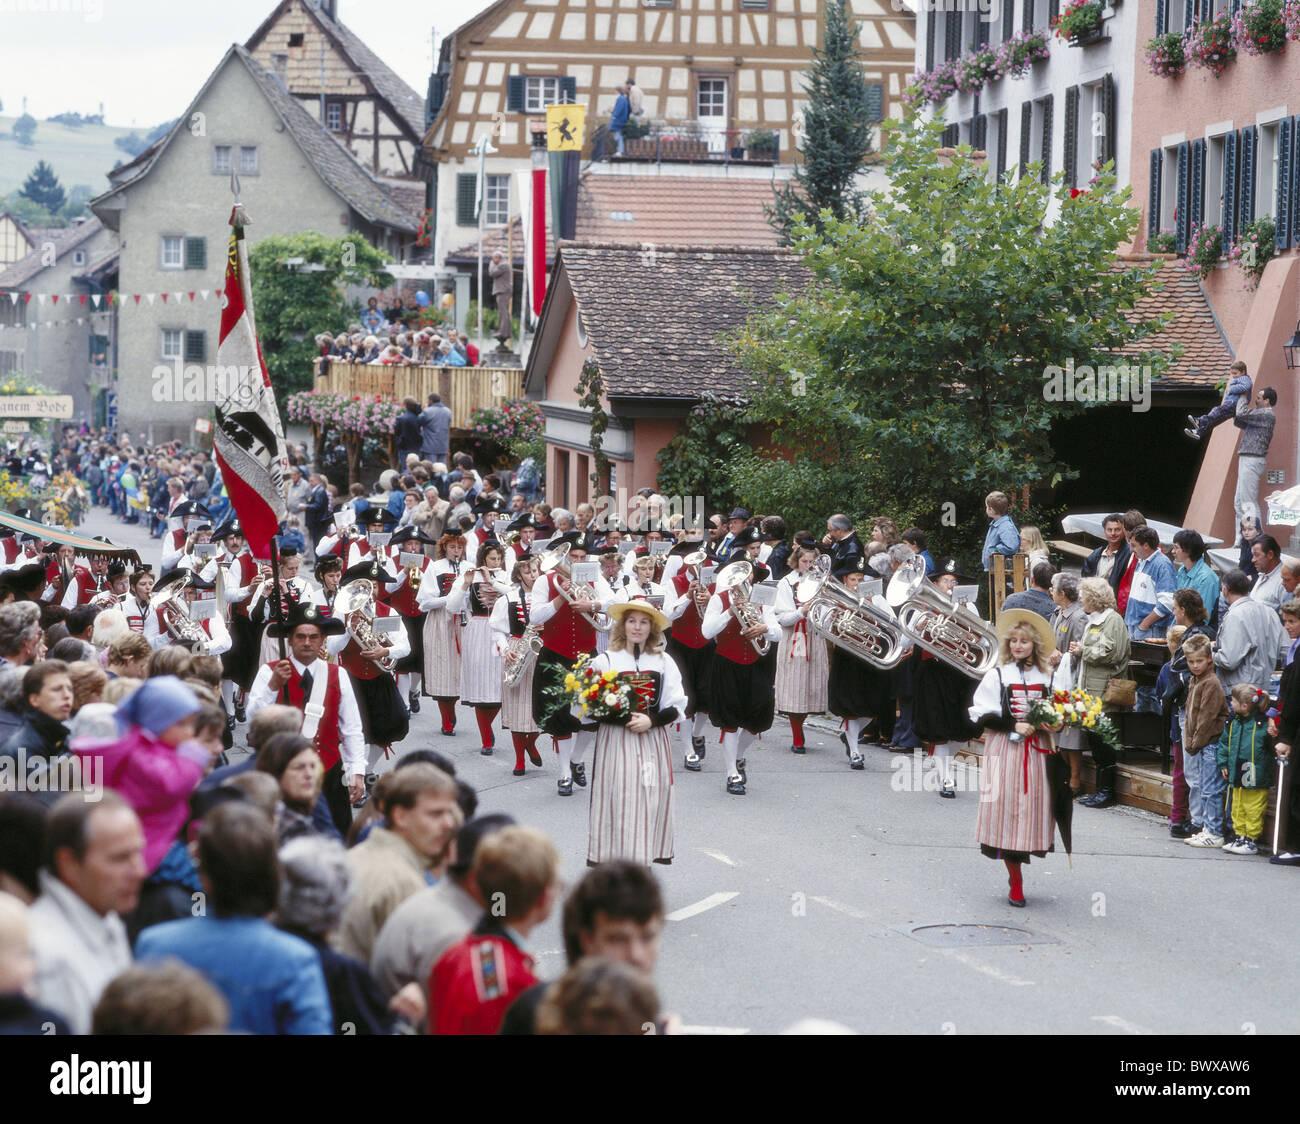 brass band music tradition blower tradition folklore Hallau canton Schaffhausen bolt houses Switzerland Eu - Stock Image